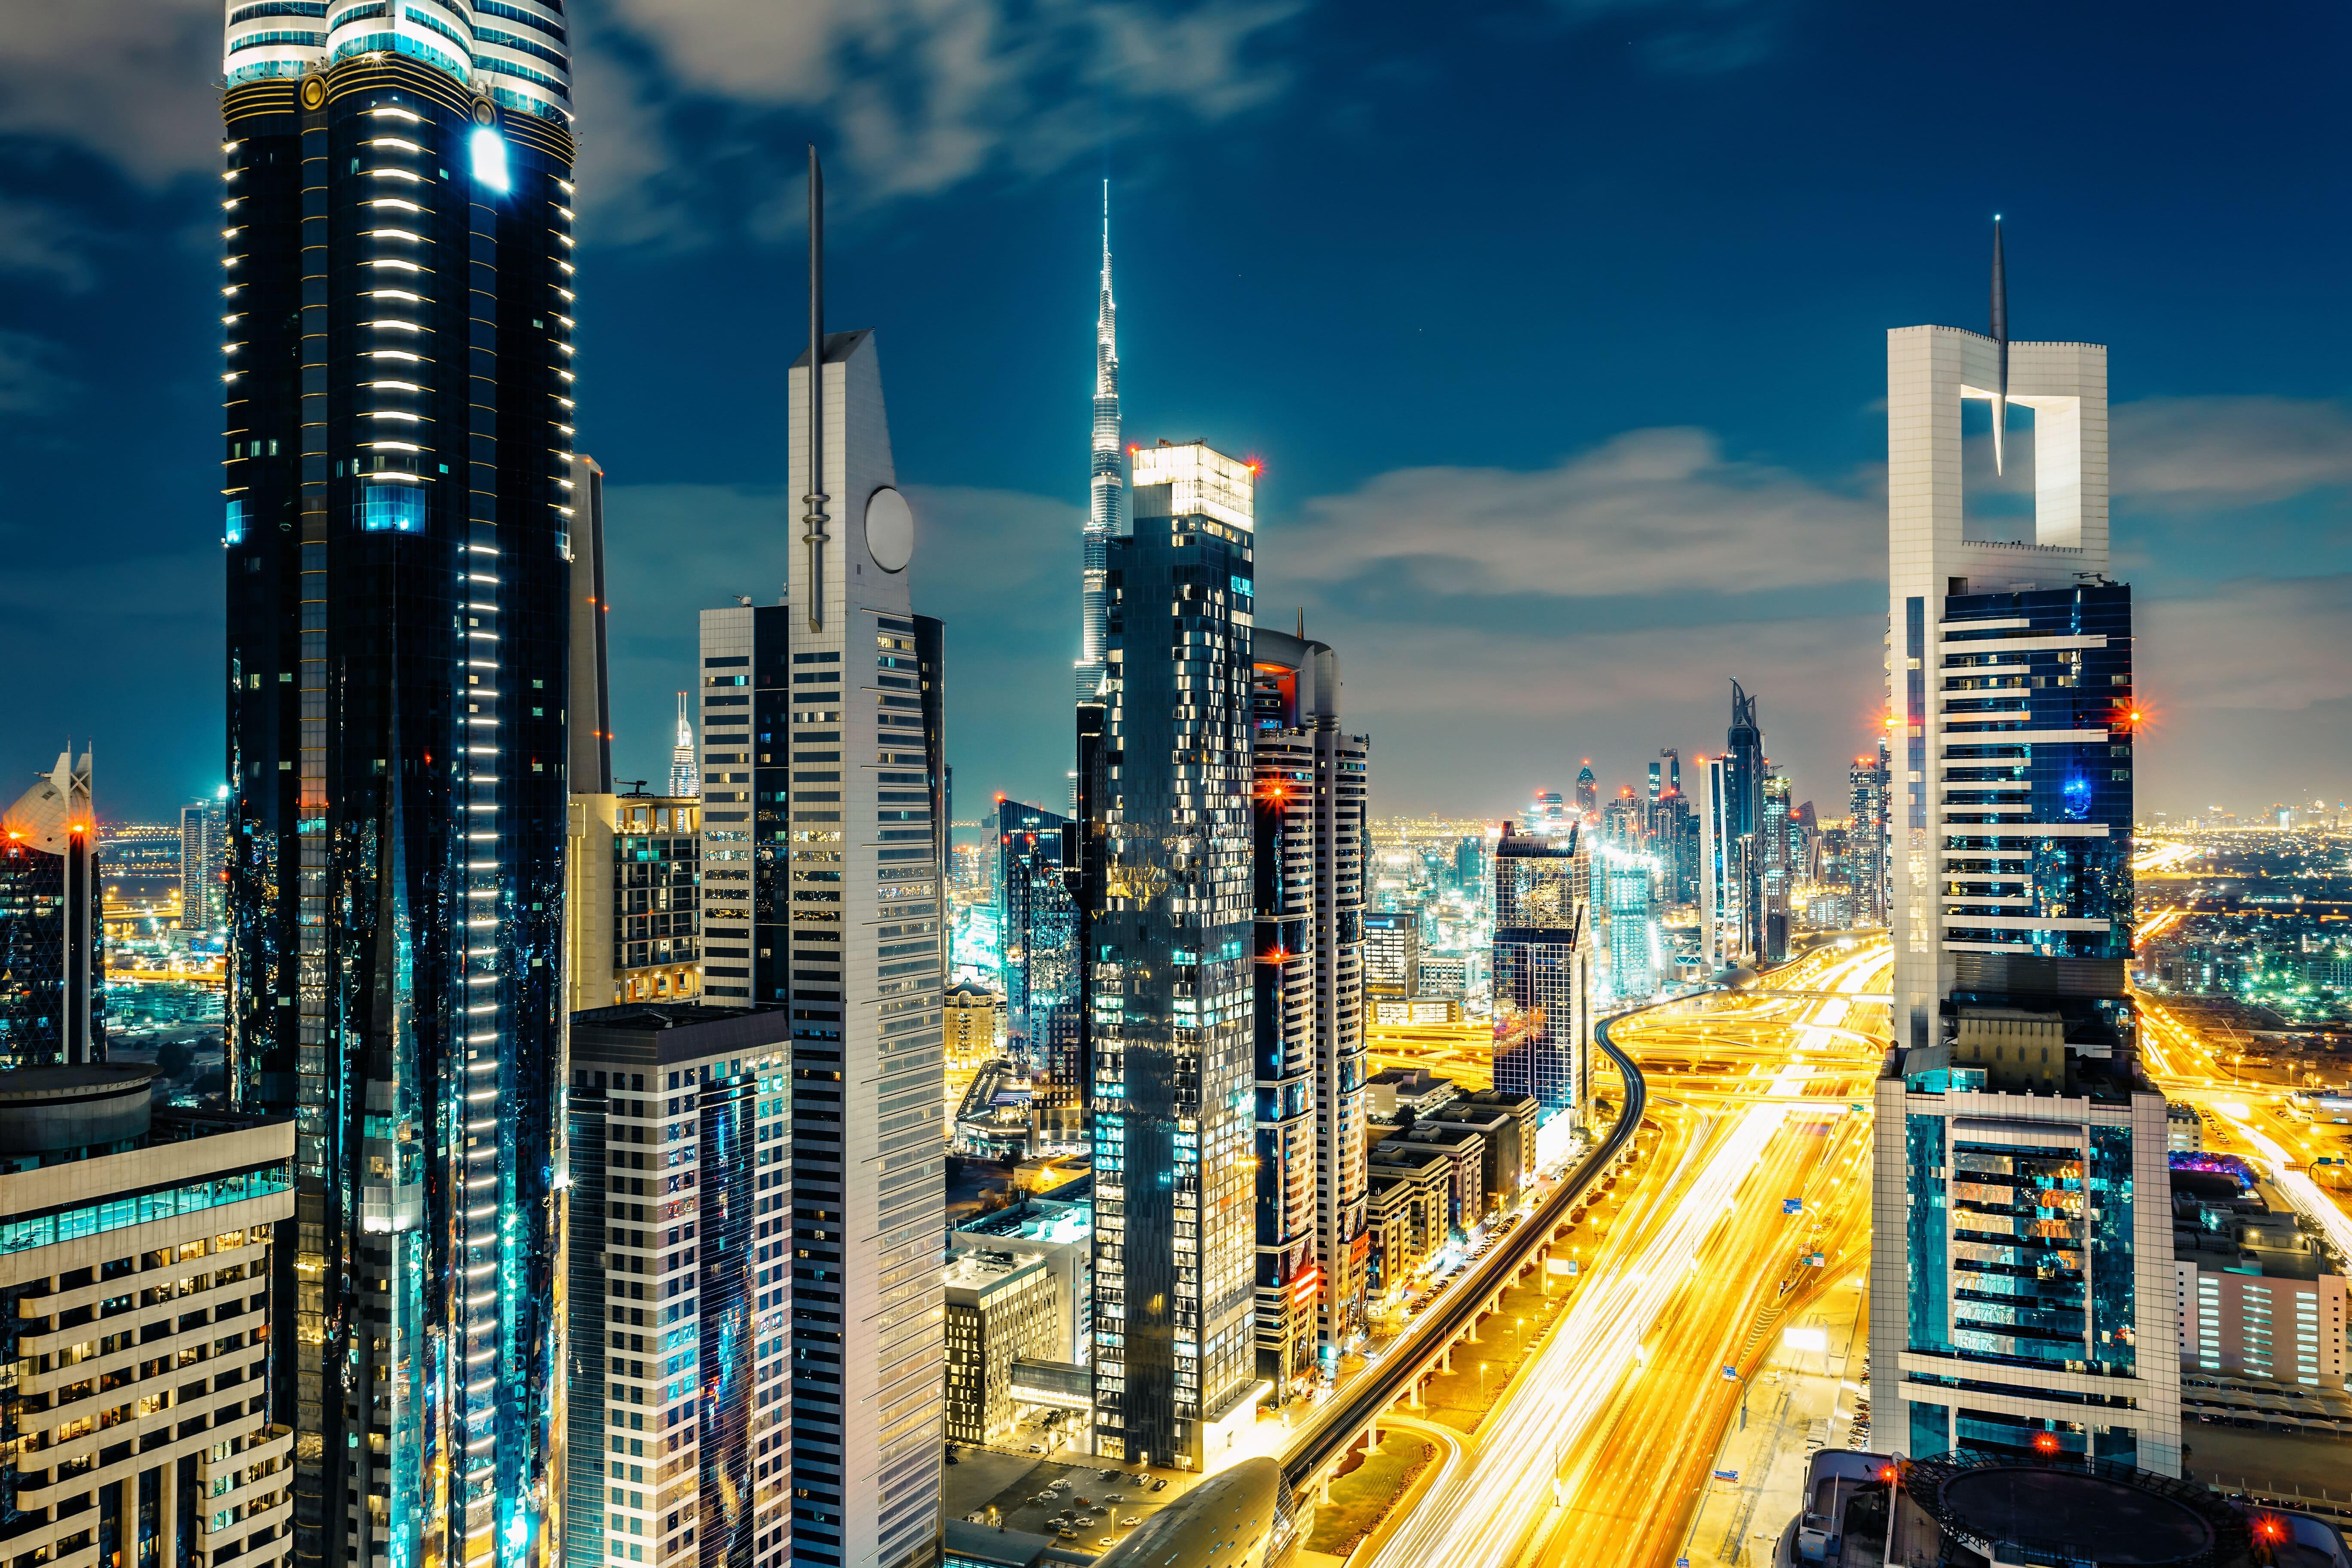 Downtown Dubai at night time